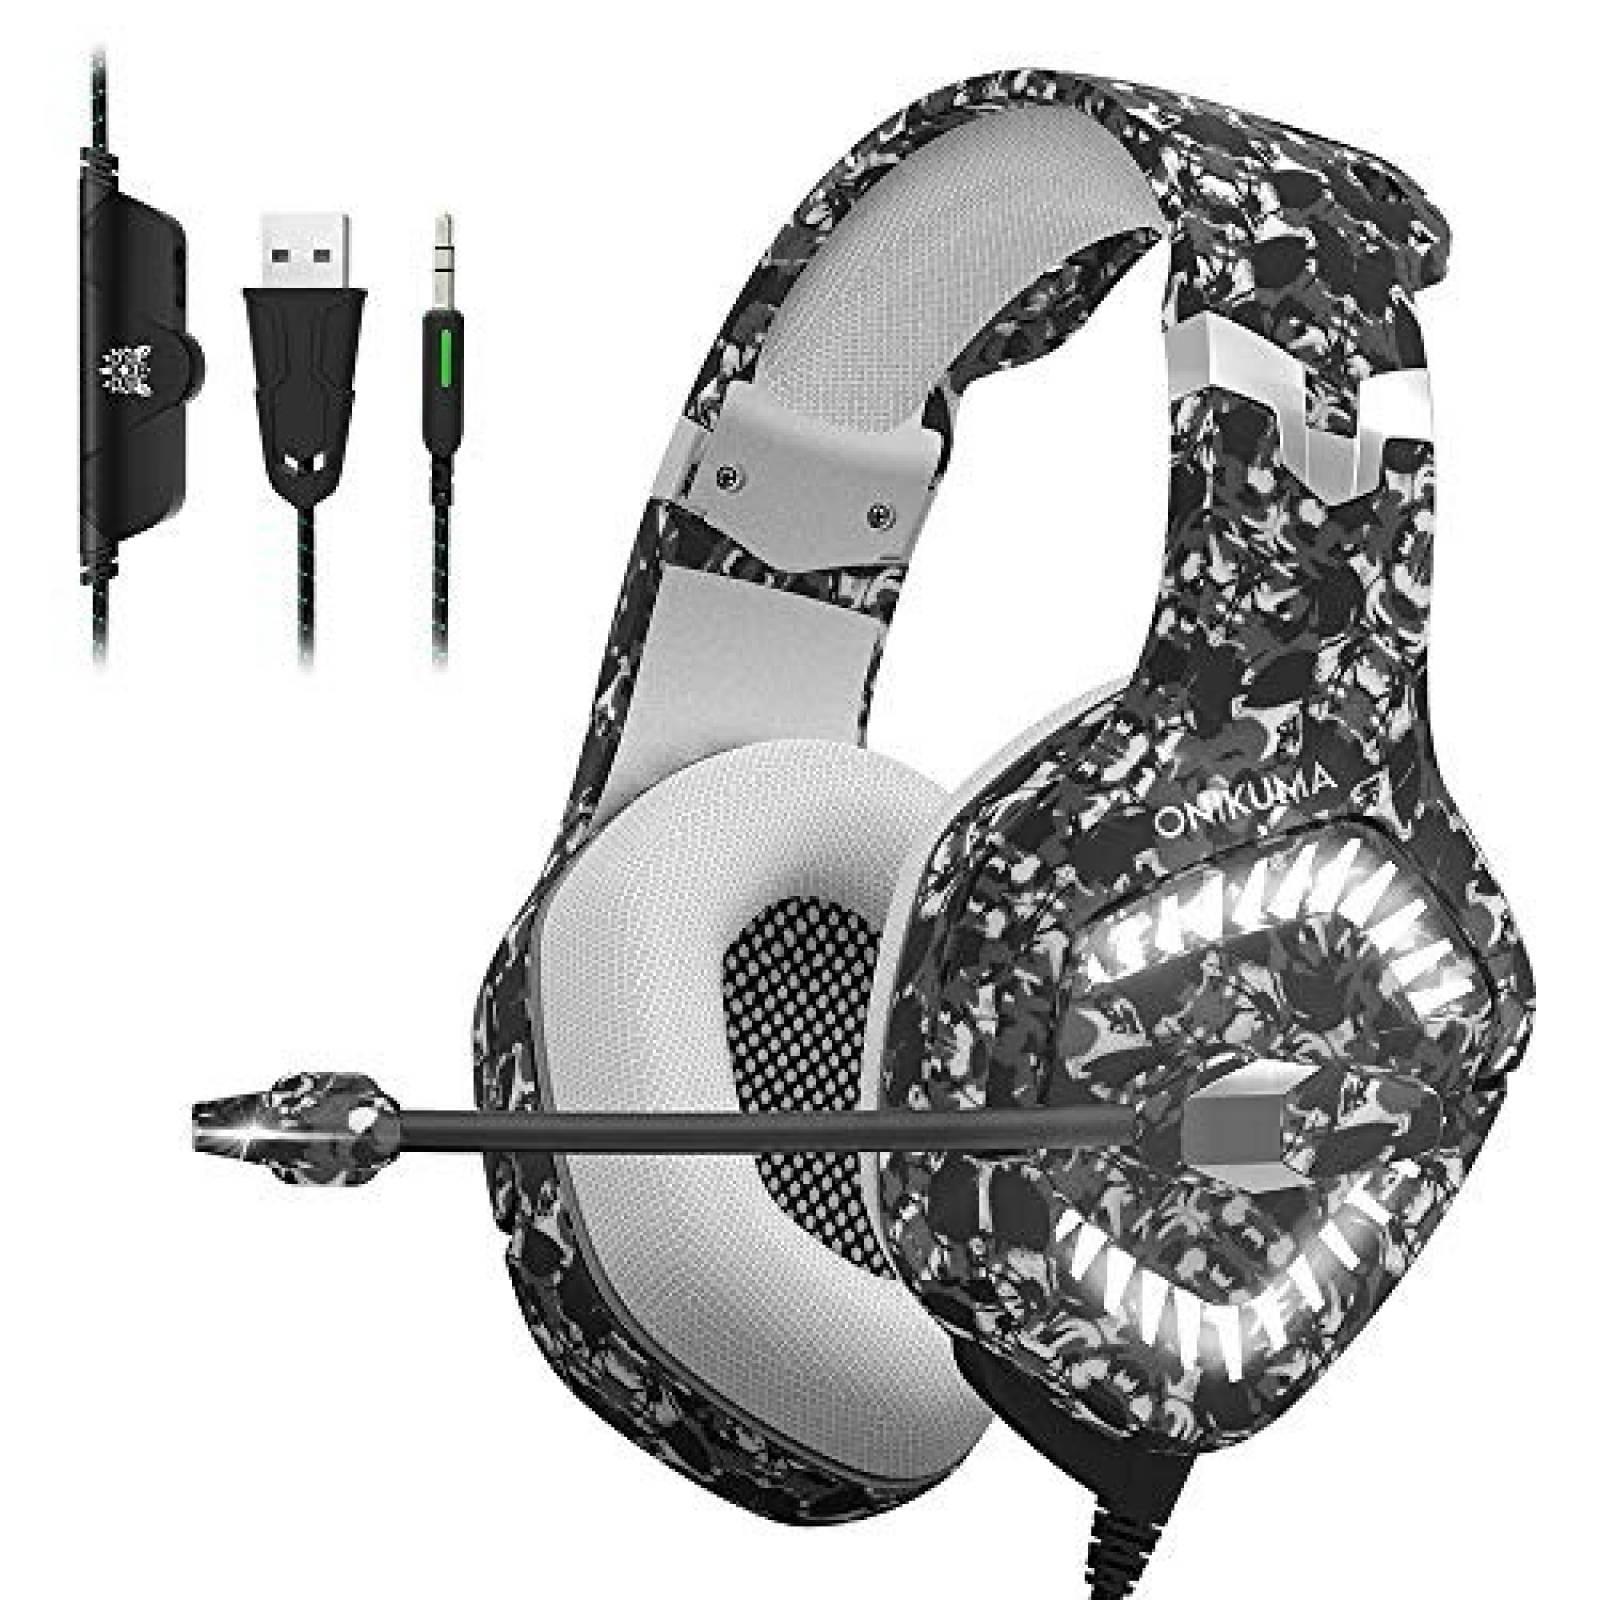 Audifonos Gamer Con Microfono Para Ps4 Xbox Pc Switch Conector 3.5 Mm